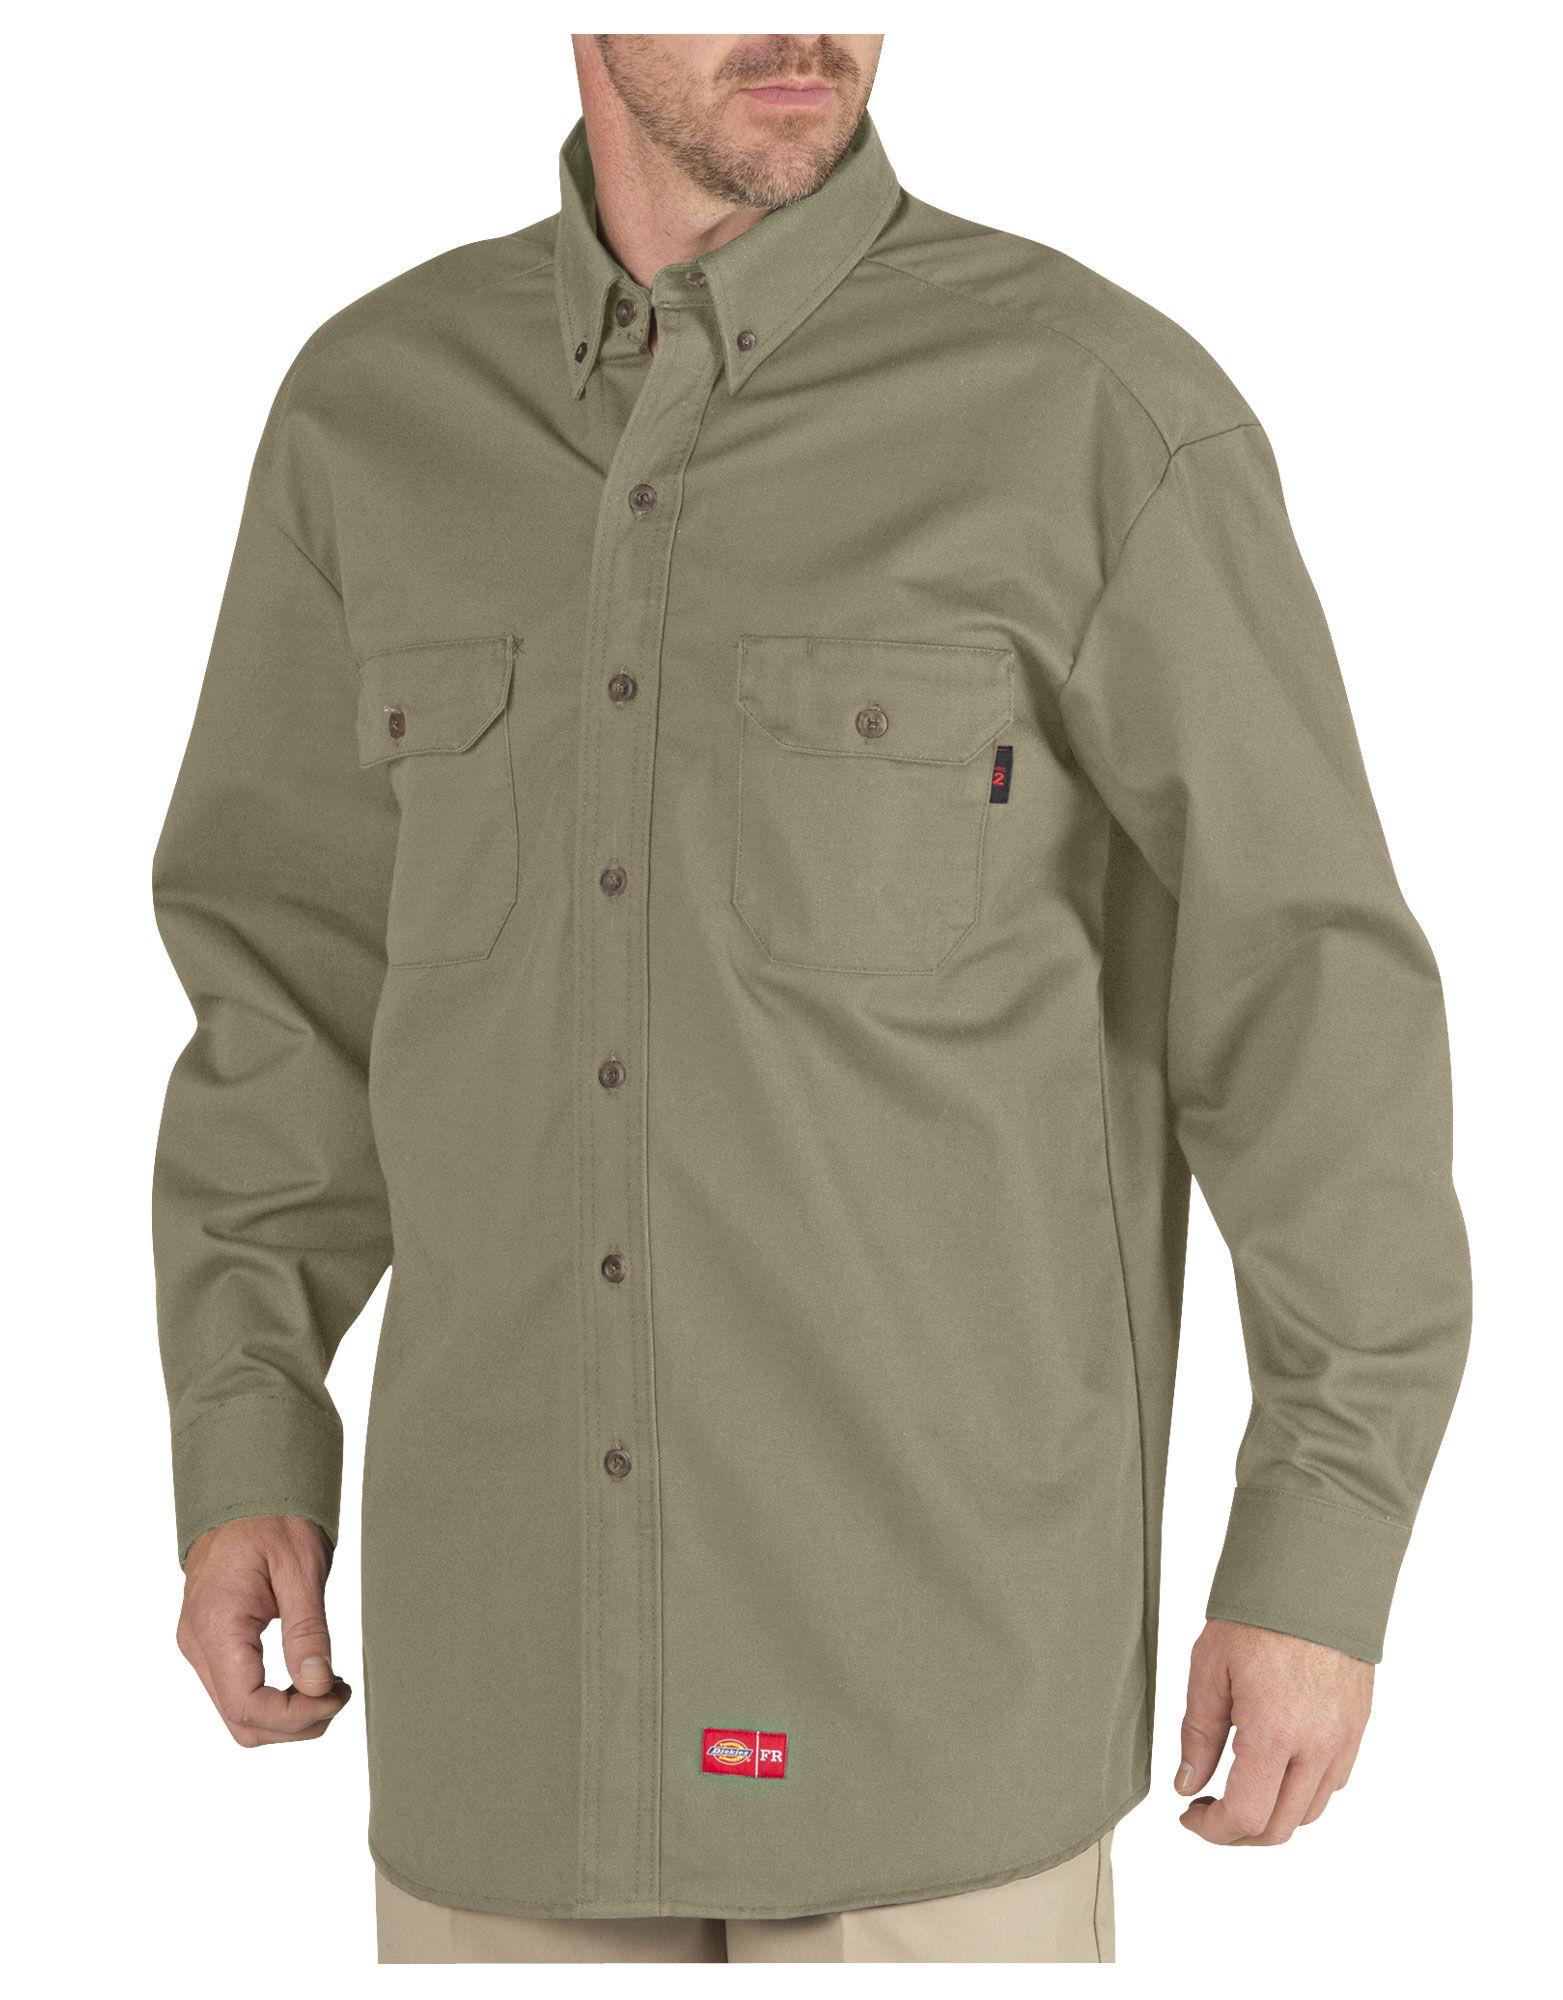 Fire Retardant Clothing Long Sleeve Button Down Shirt